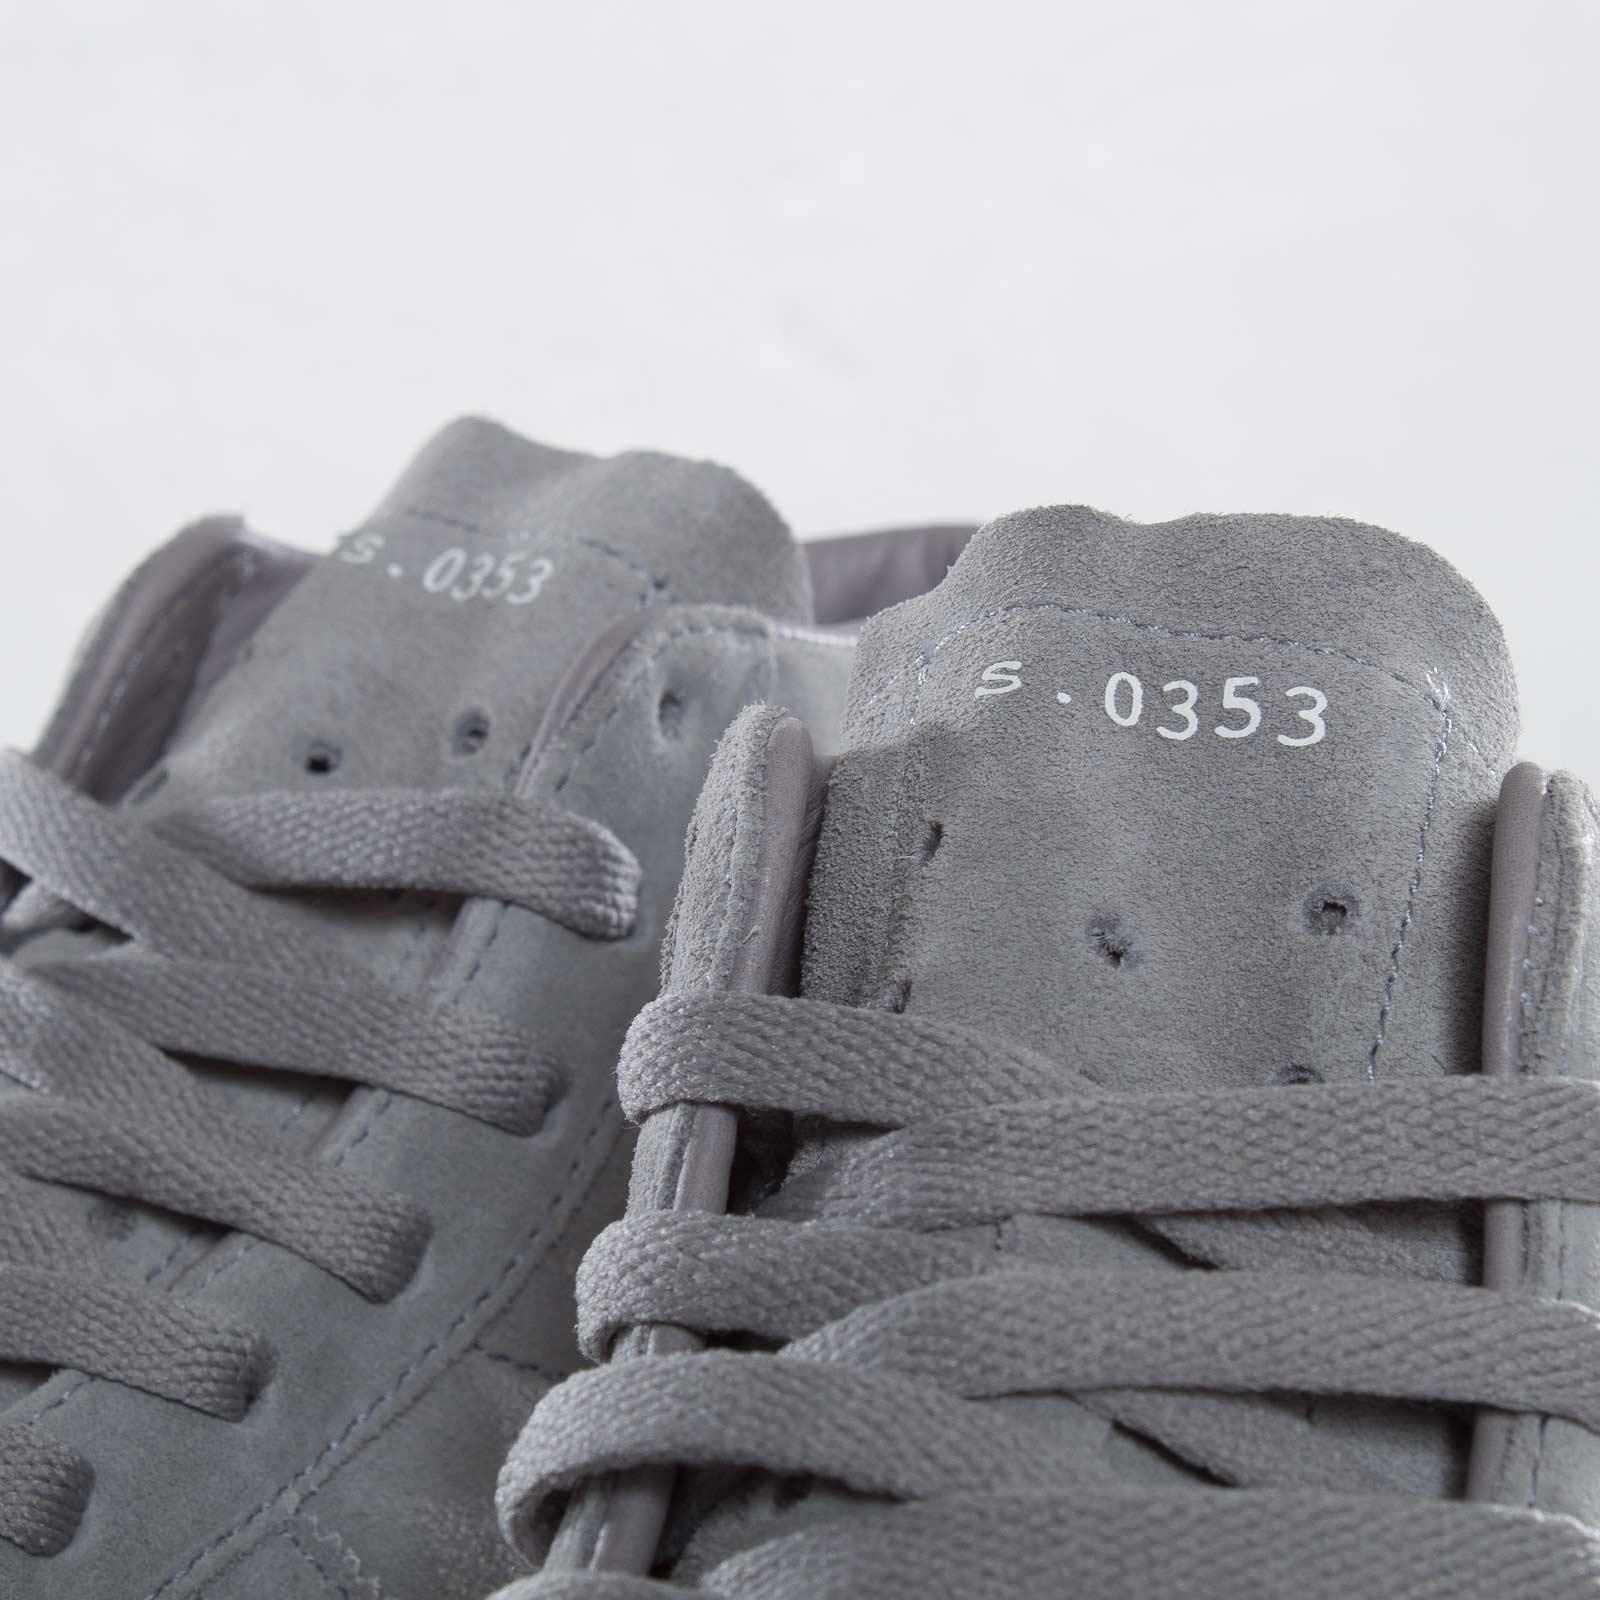 brand new 71863 3fa05 ... adidas Basket Profi The Soloist ...